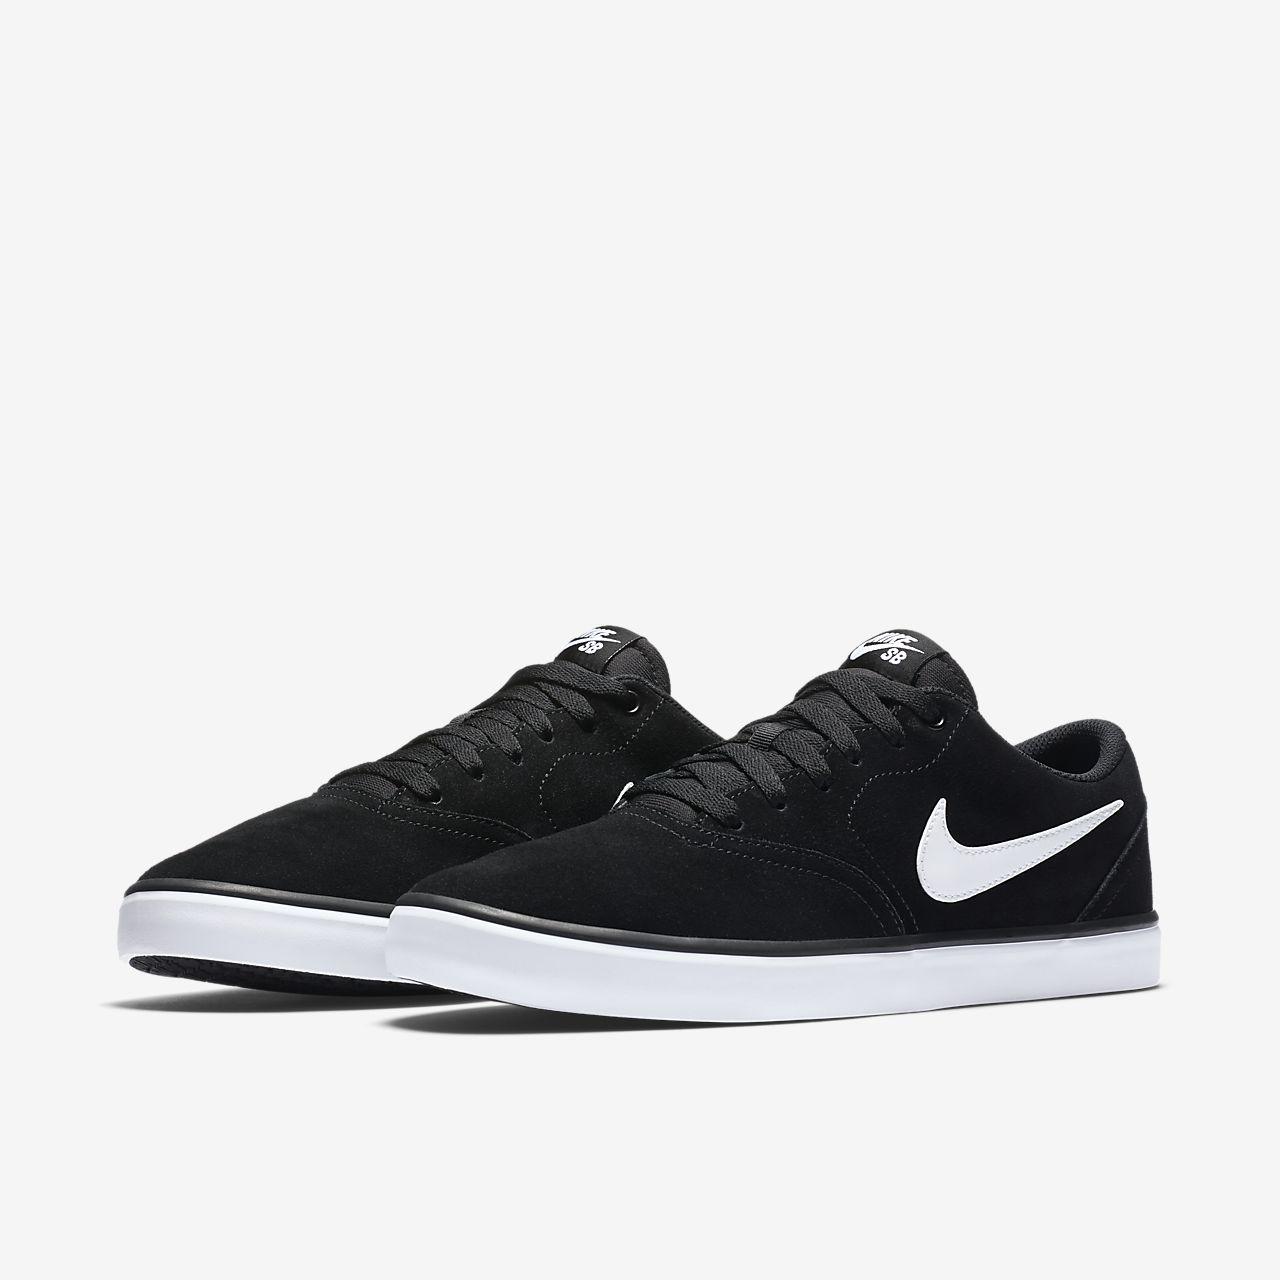 Nike SB Portmore II Solar CNVS, Chaussures de Skateboard Homme, Noir (Black/Black 001), 45 EU